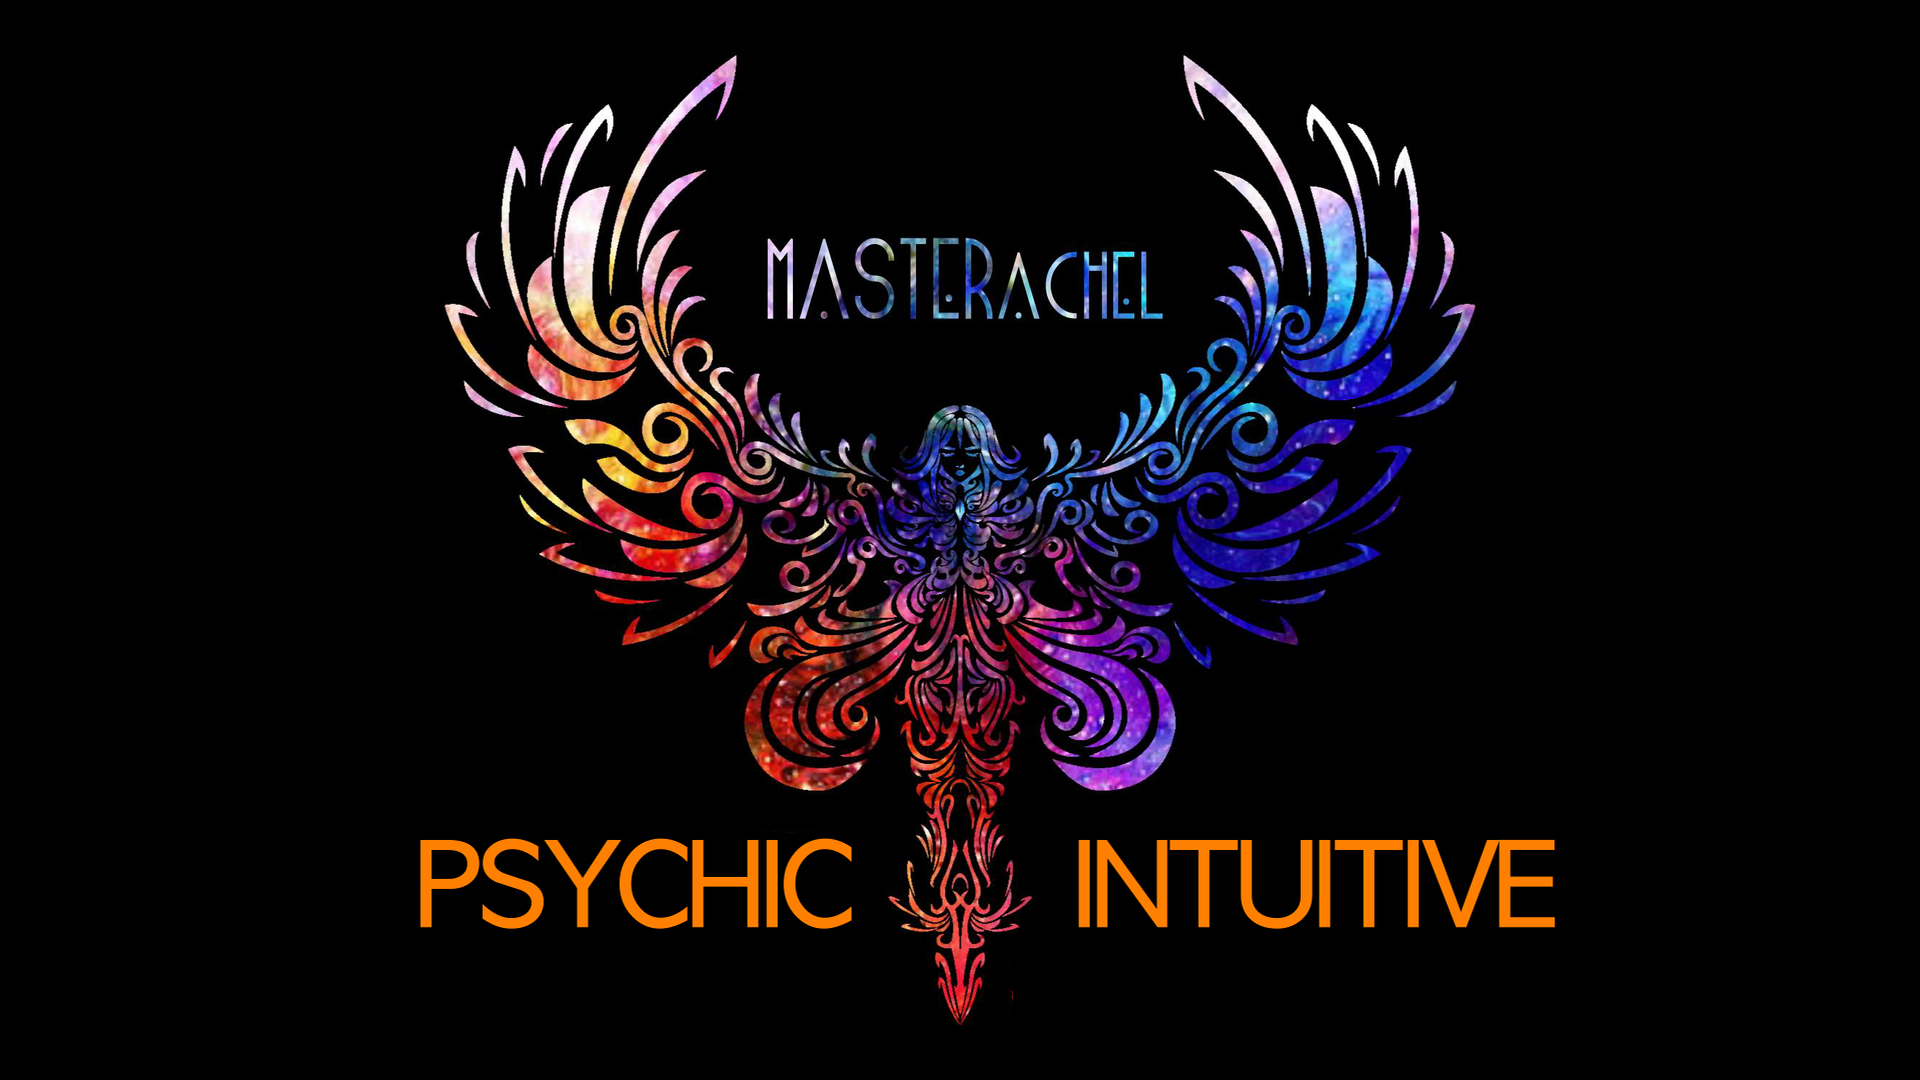 www.masterachel.com